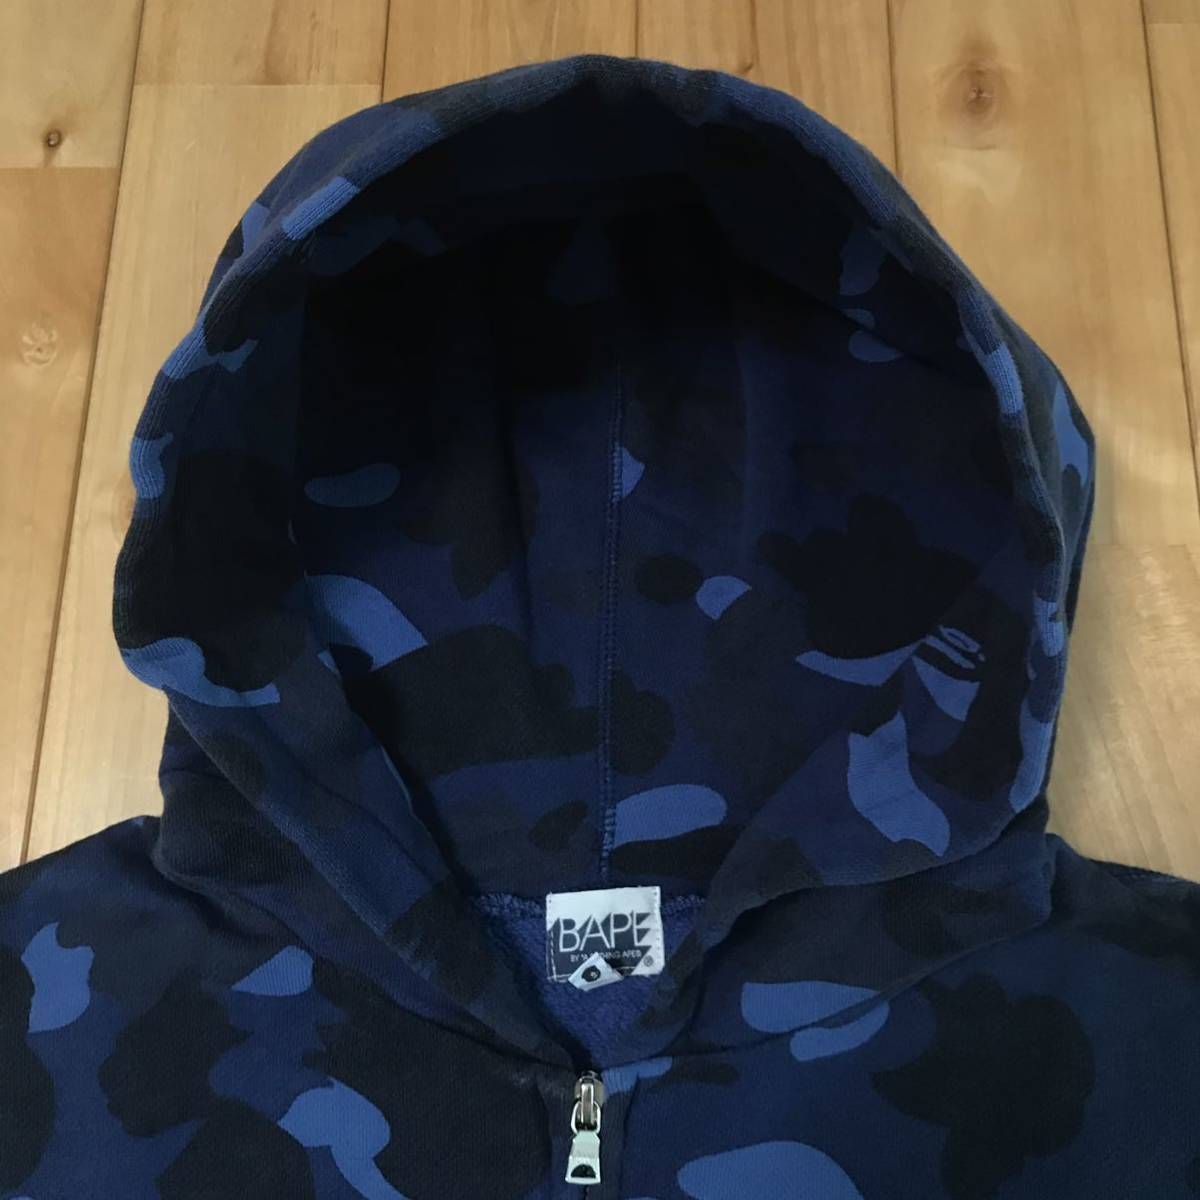 blue camo スウェット フード ベスト Mサイズ a bathing ape bape zip hoodie vest エイプ ベイプ アベイシングエイプ パーカー 迷彩 3122